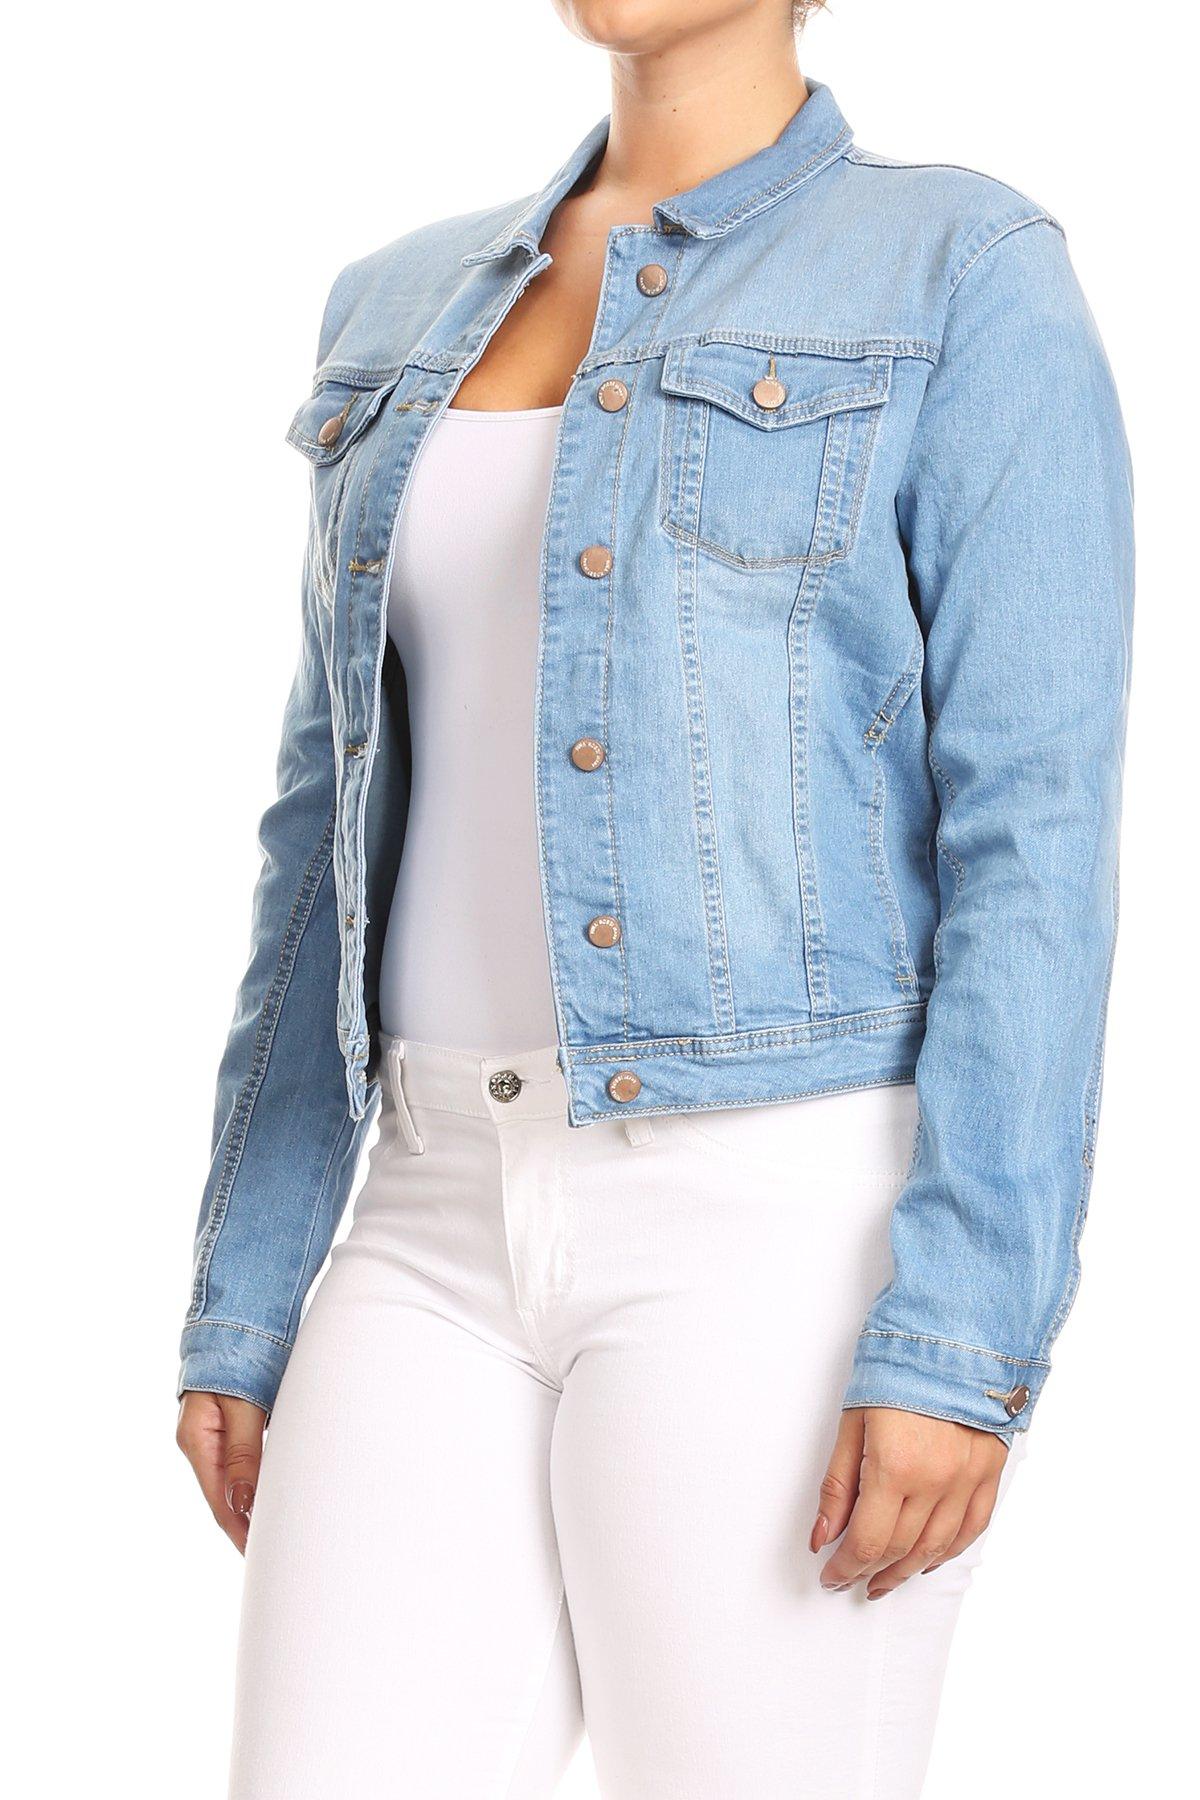 JKT102PS-Women-039-s-Plus-Size-Premium-Denim-Jackets-Long-Sleeve-Loose-Jean-Coats thumbnail 7